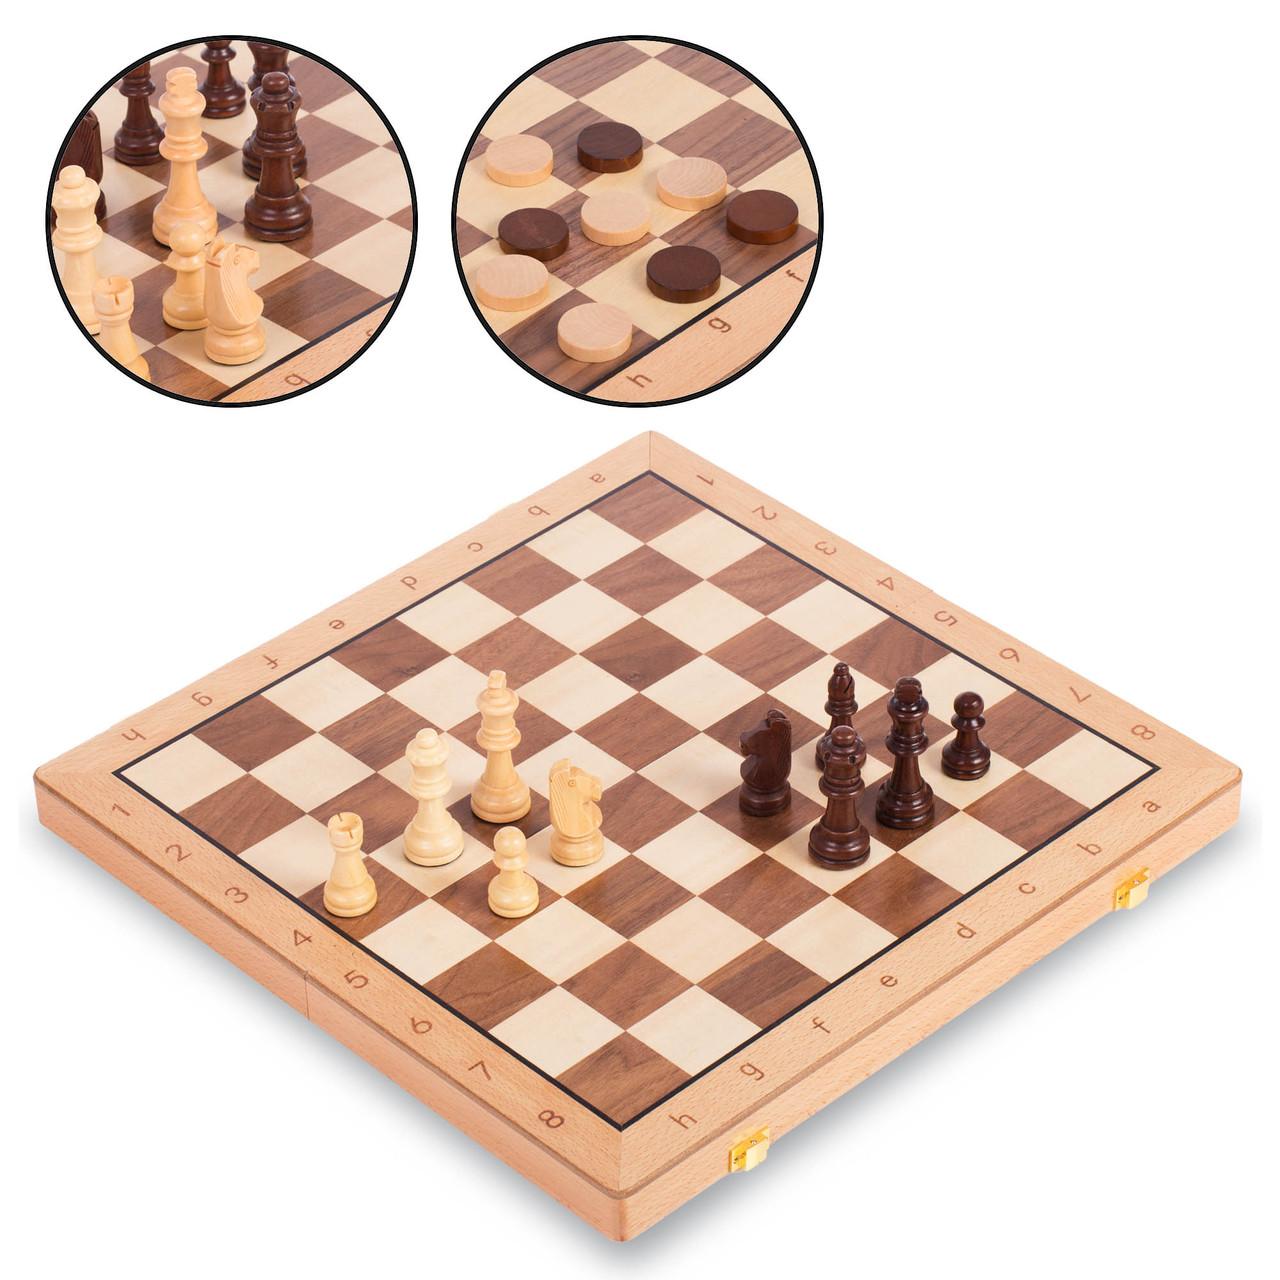 Шахматы, шашки 2 в 1 деревянные 43 x 43 см W9042